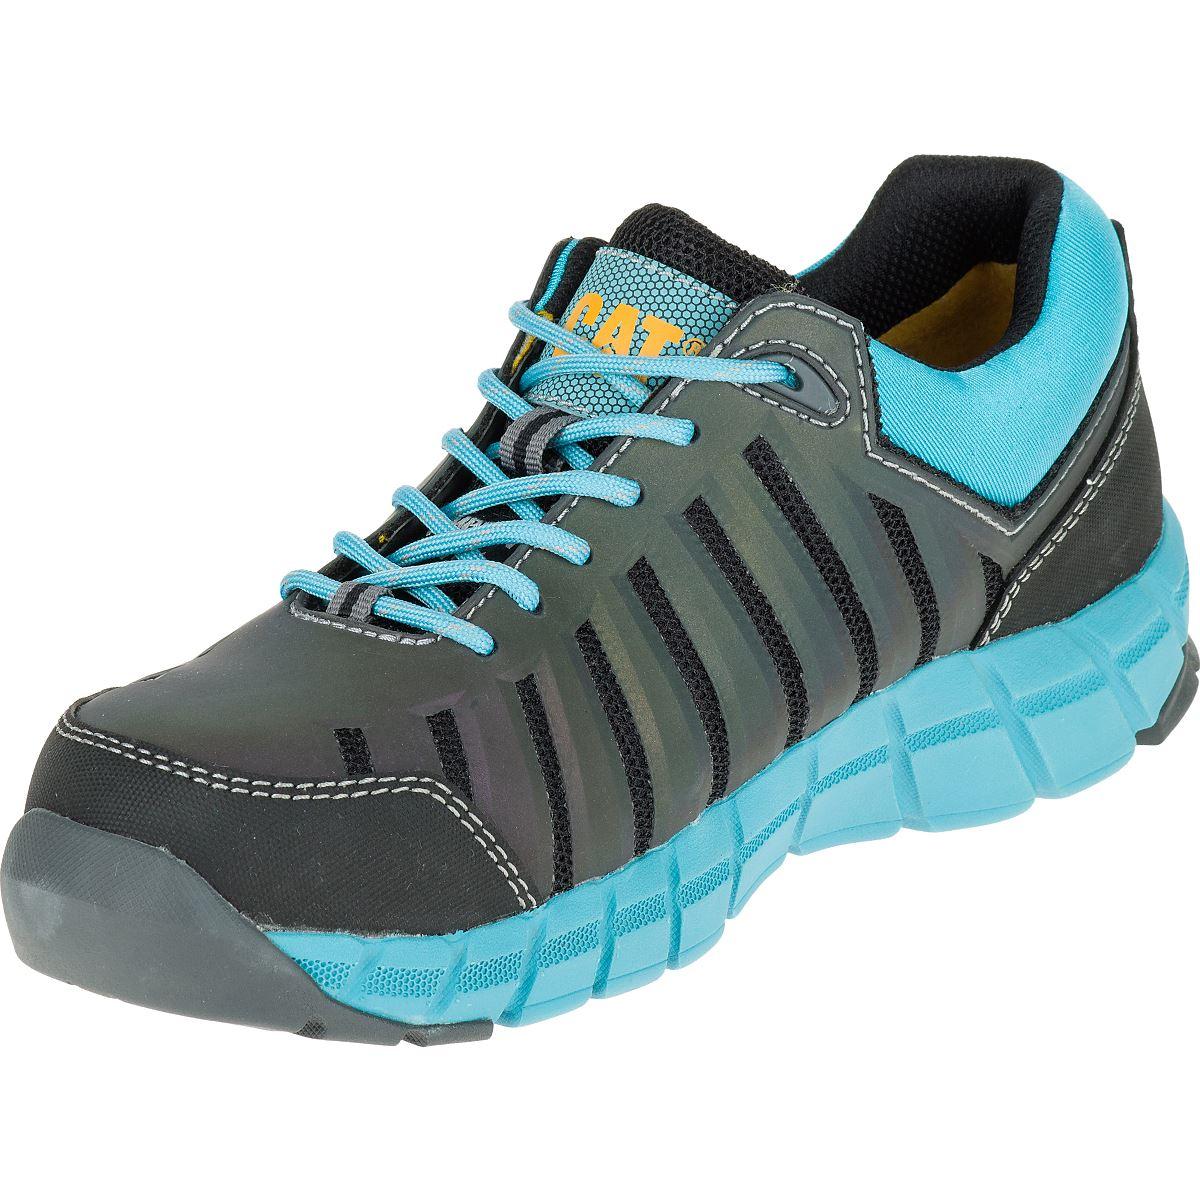 Chromatic Composite Toe Work Shoe